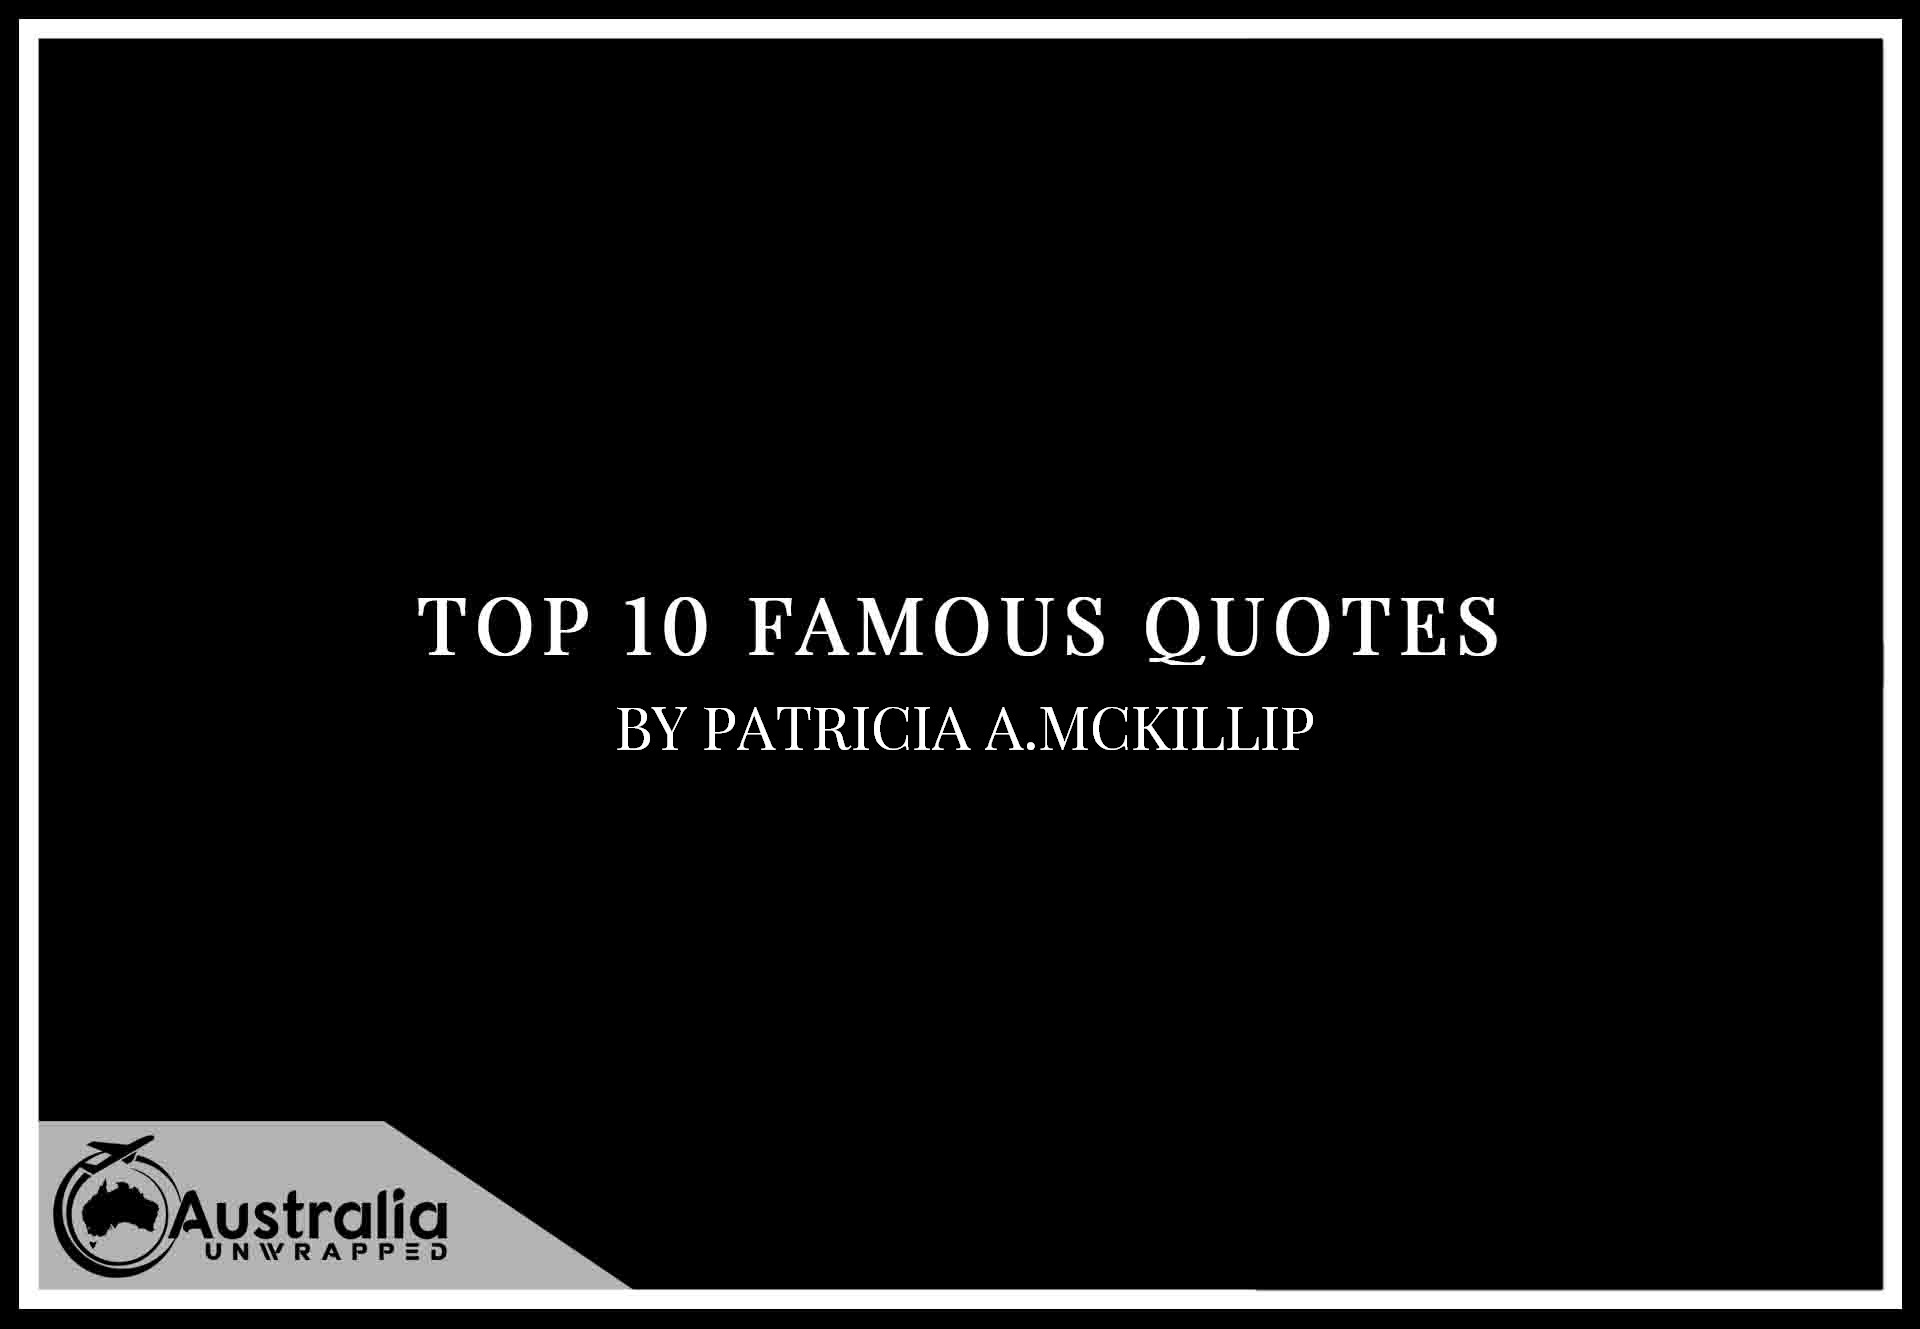 Top 10 Famous Quotes by Author Patricia A. McKillip